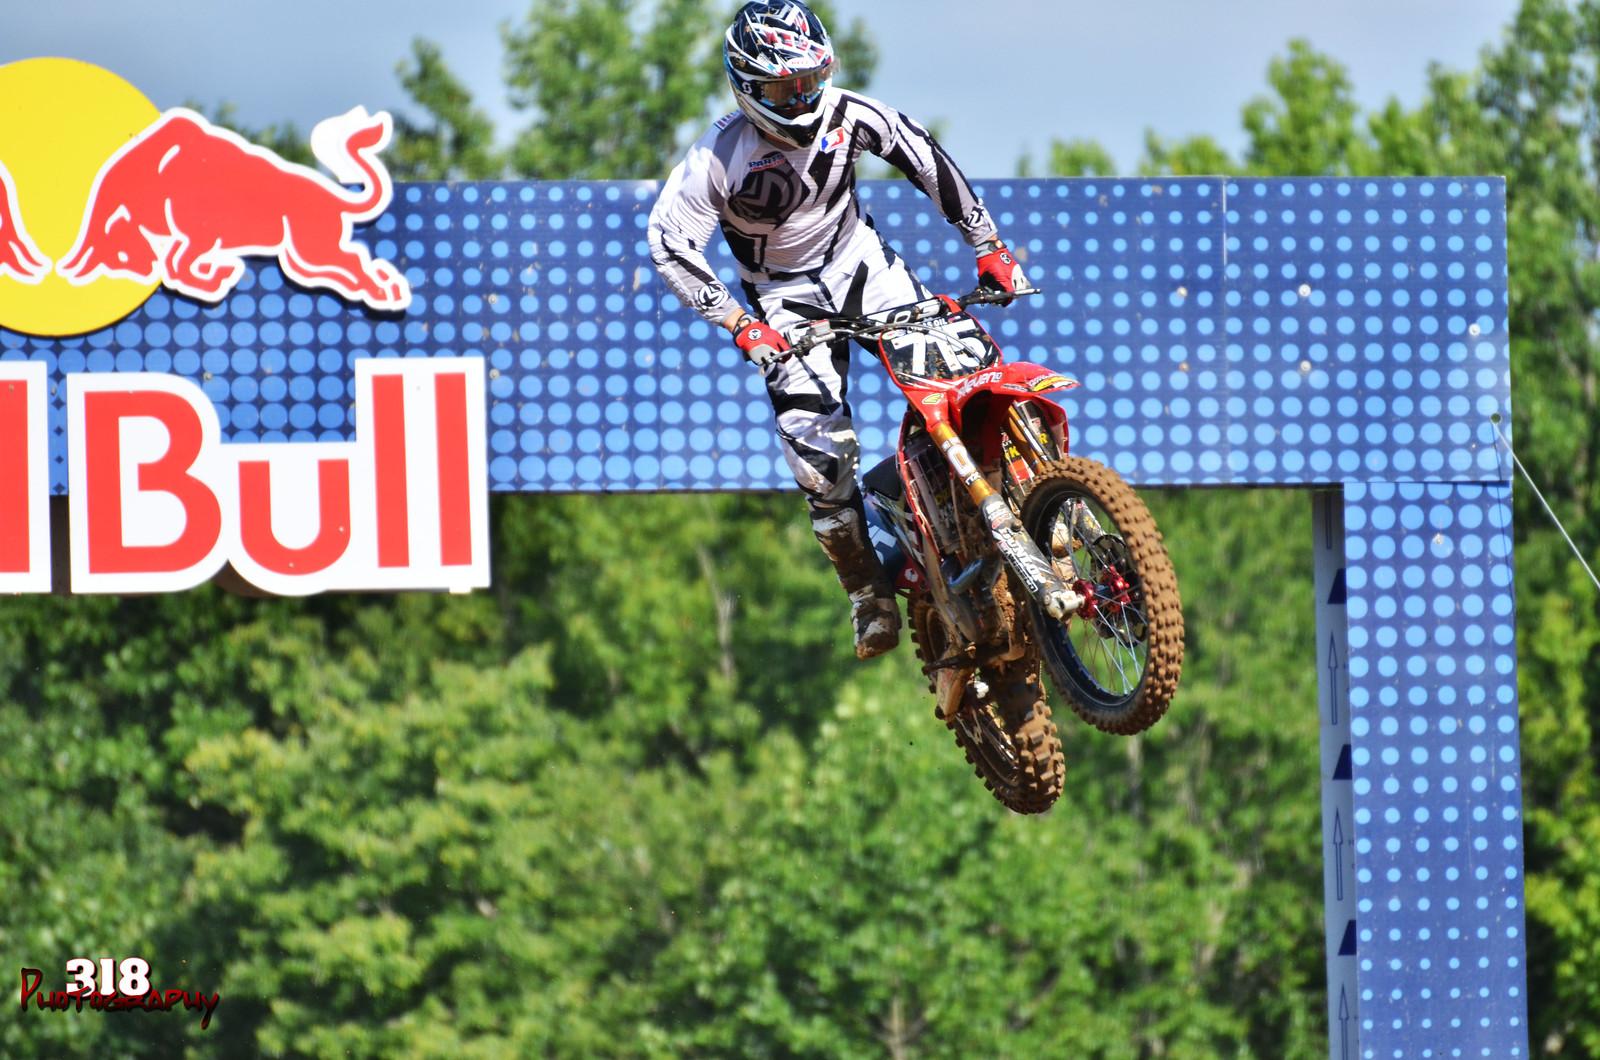 715-01 - MxPro318 - Motocross Pictures - Vital MX